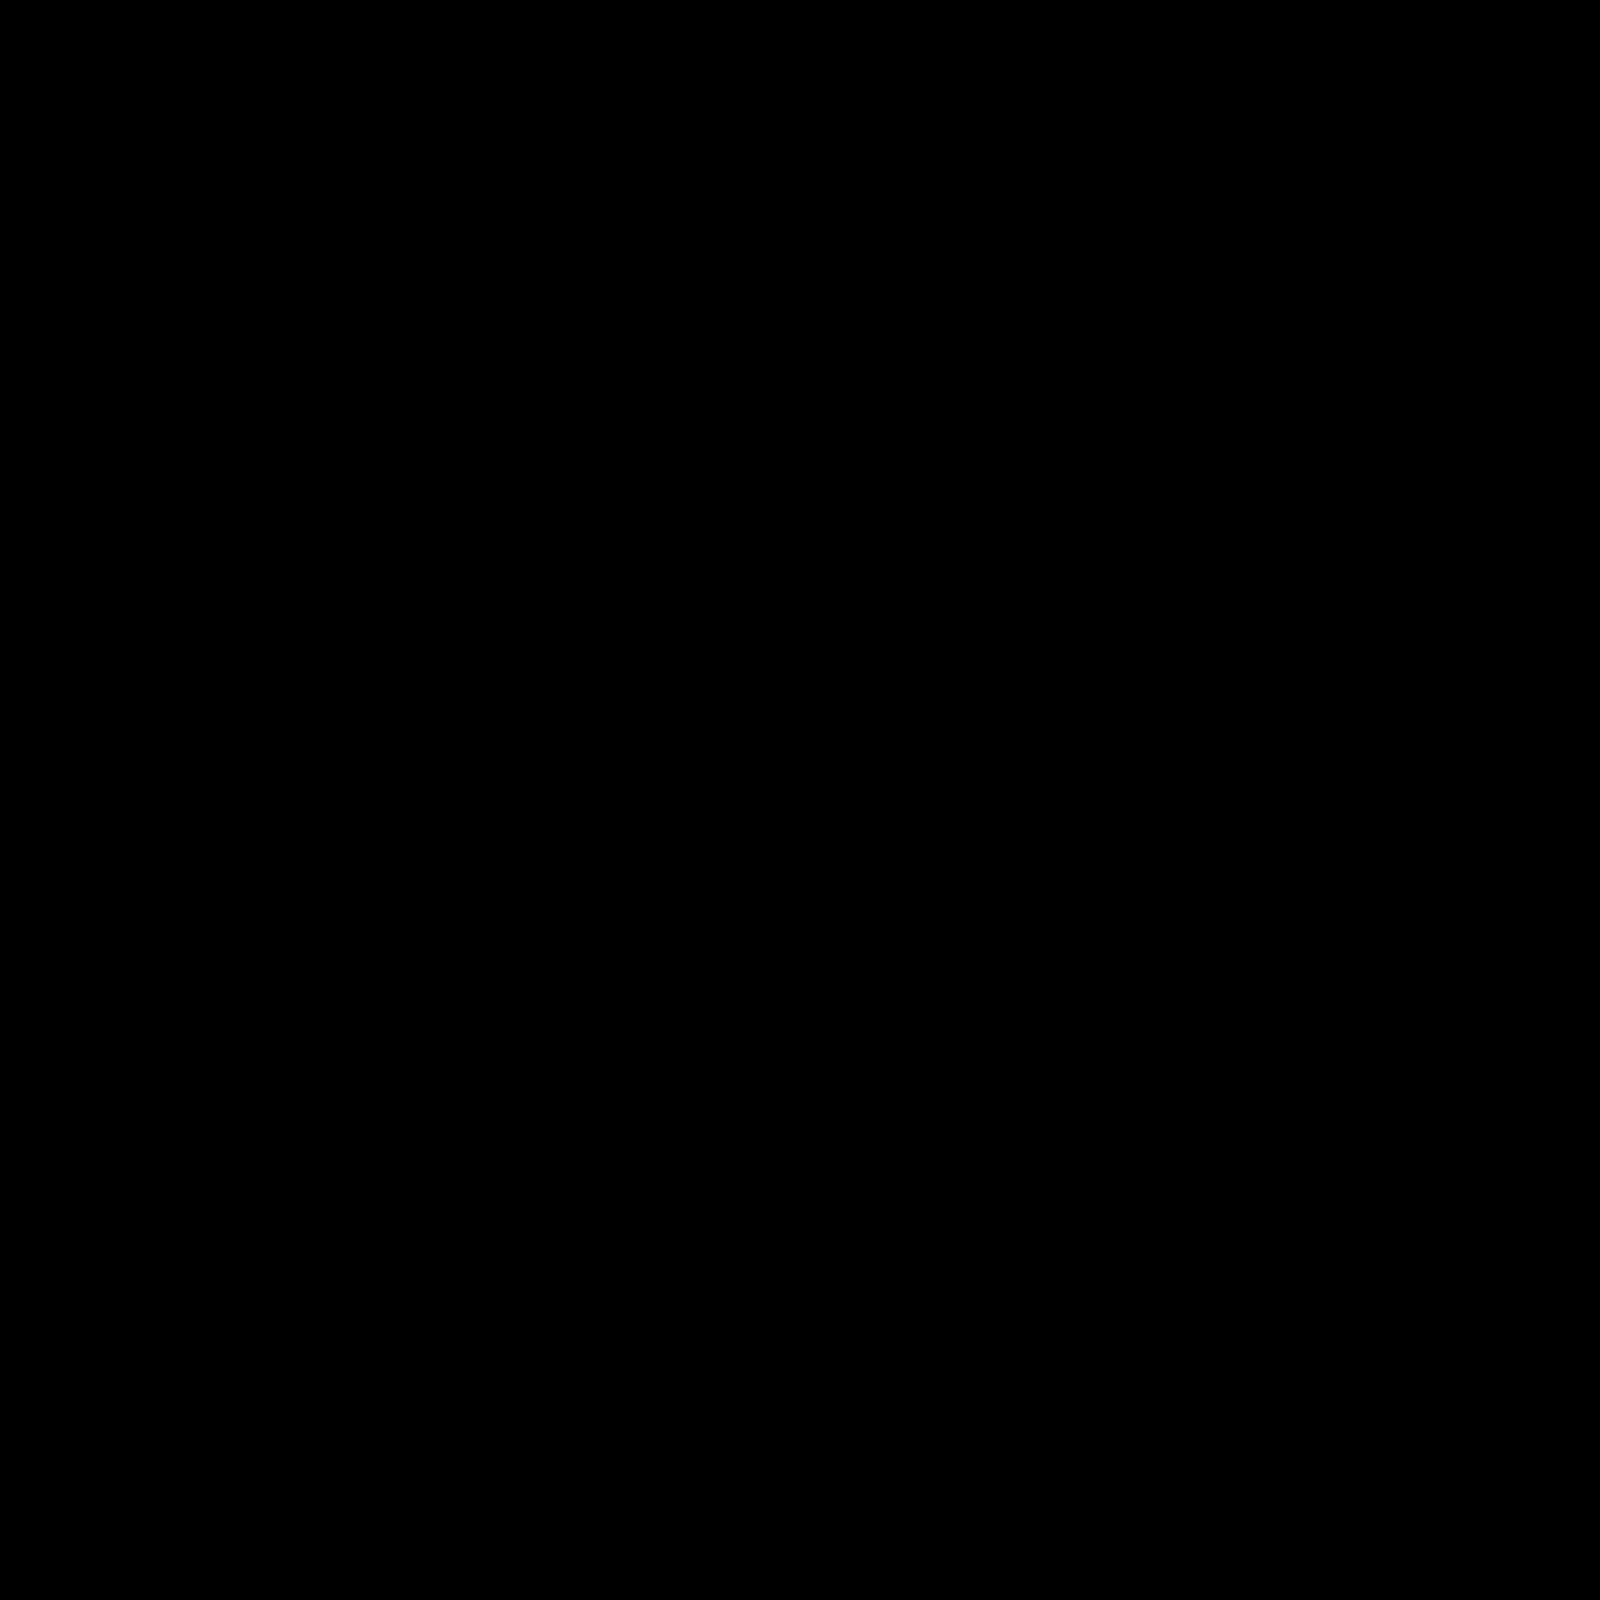 Suecia Mapa icon